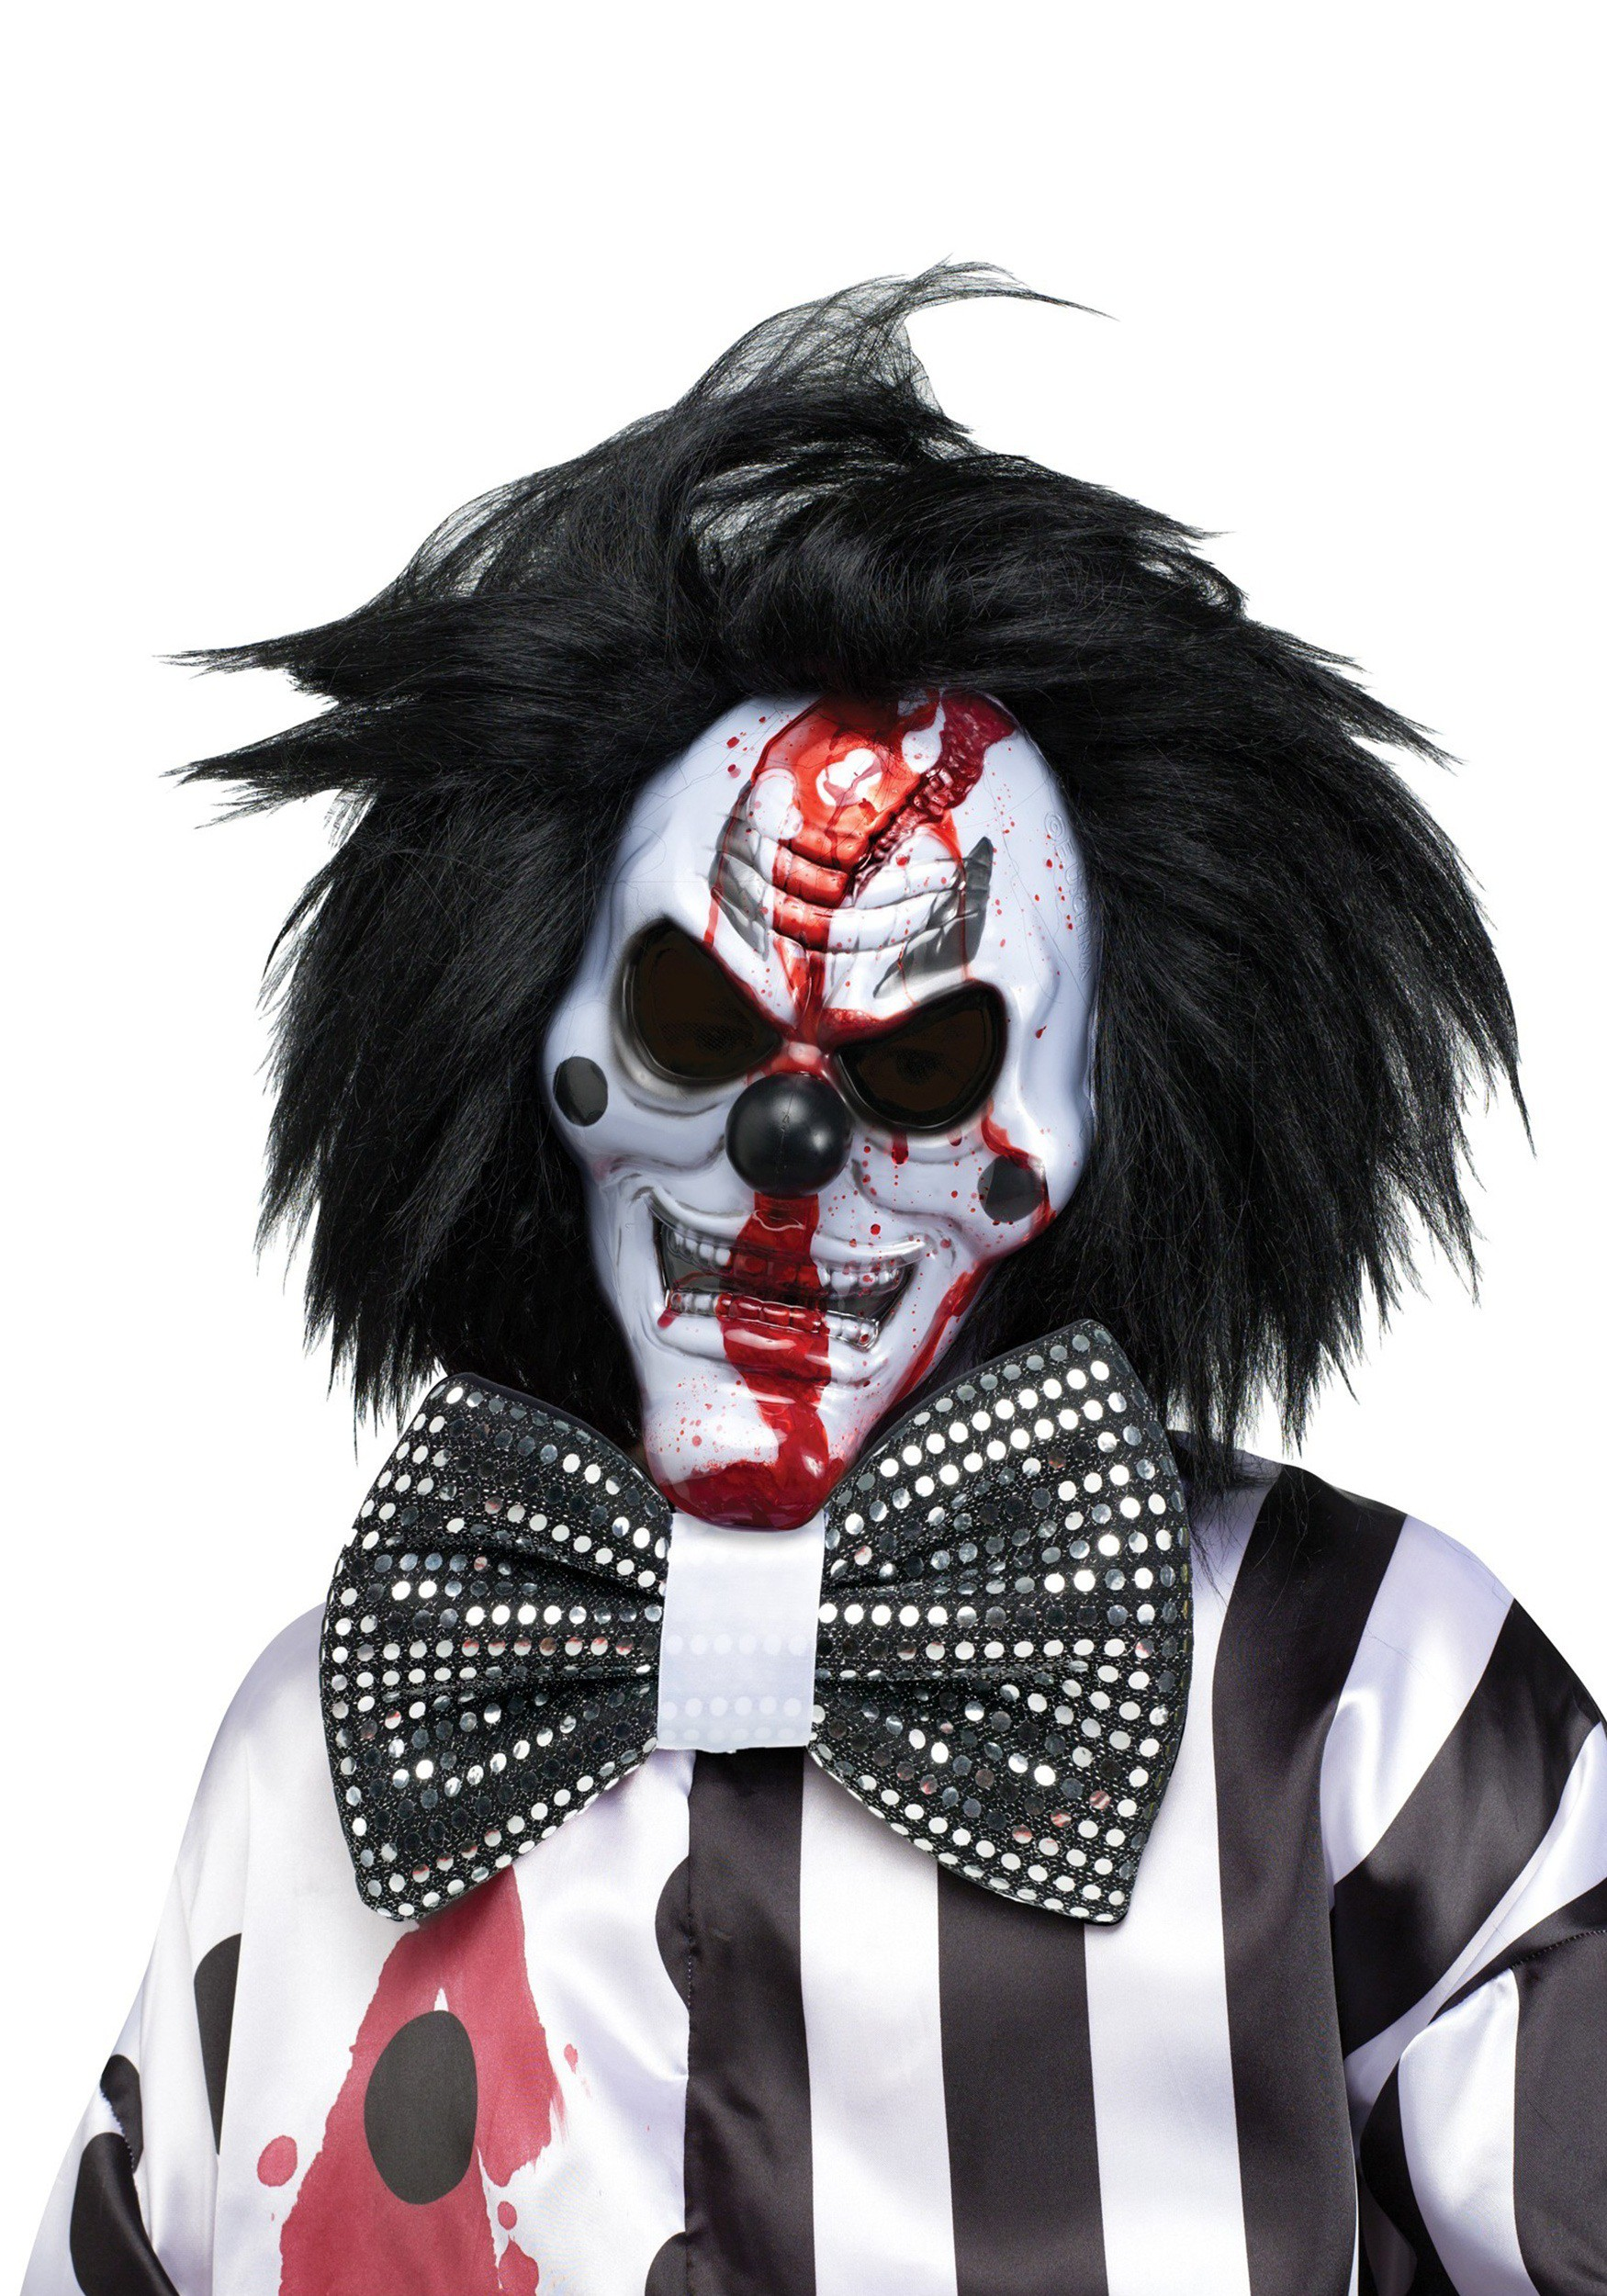 Spirit Halloween Clown Costumes Kids.Kids Bleeding Killer Clown Costume